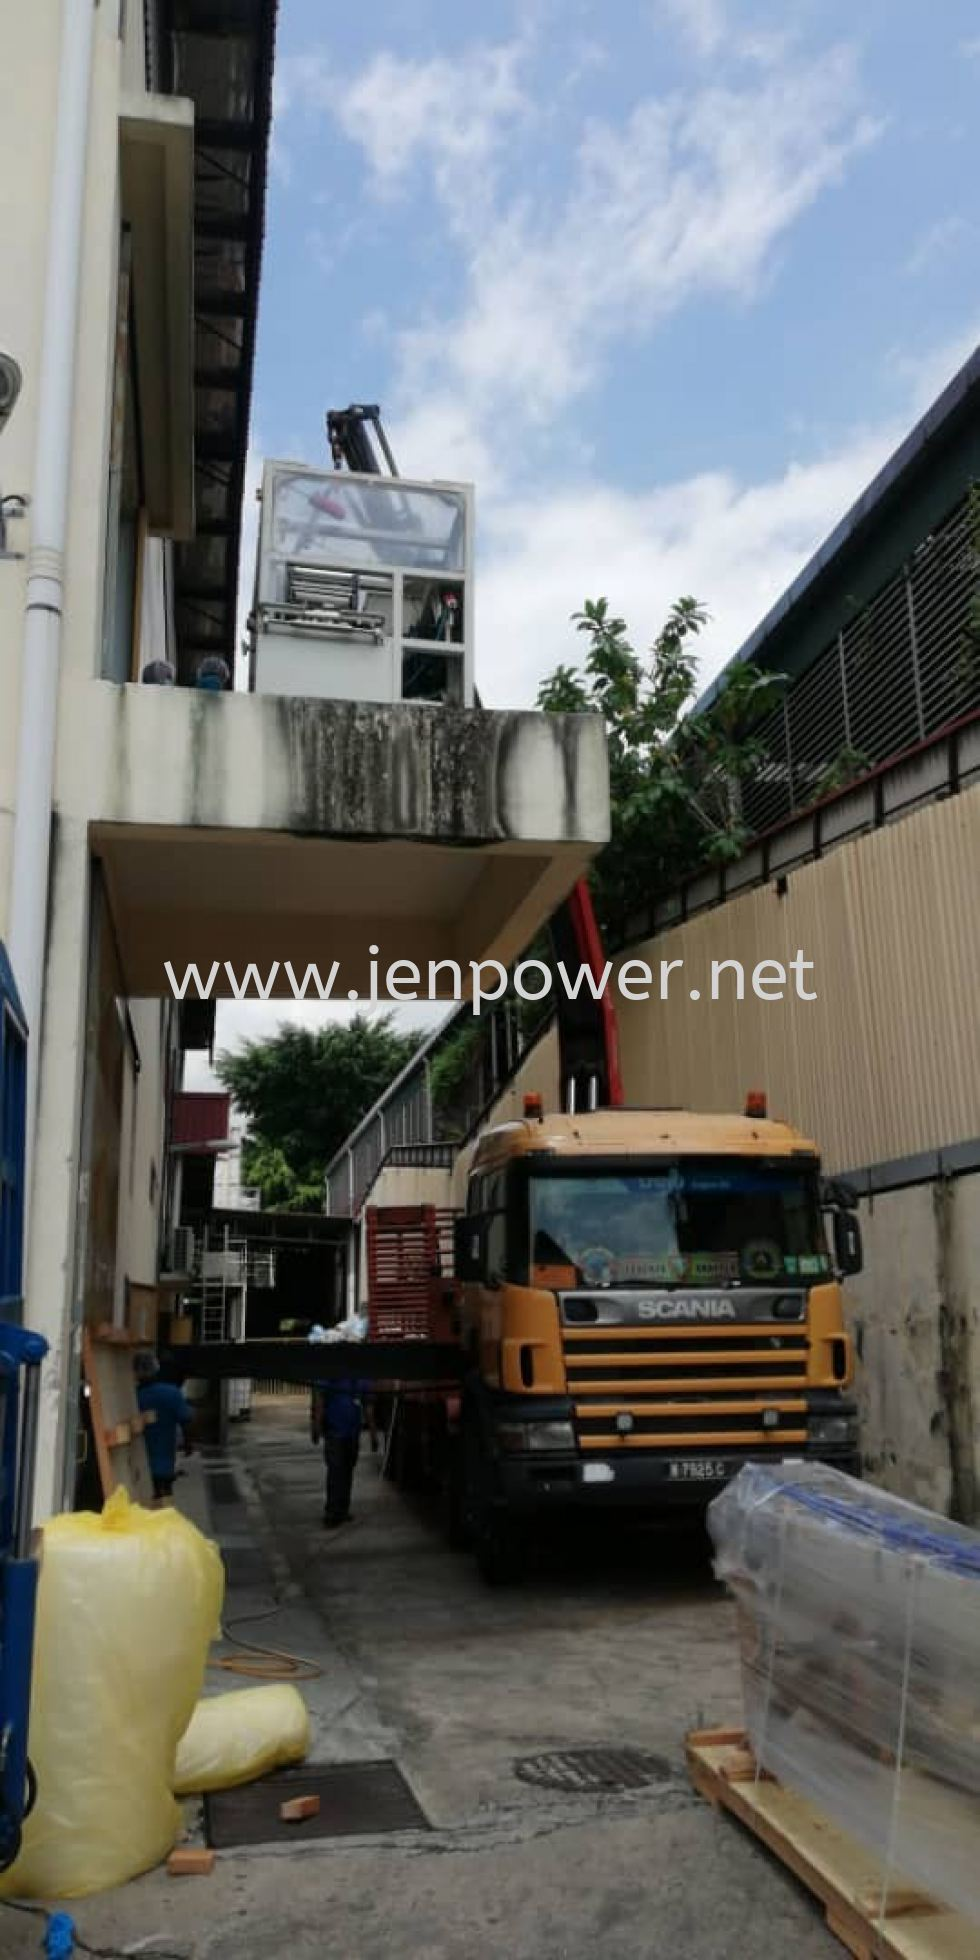 Lorry Crane Lifting Up Machine